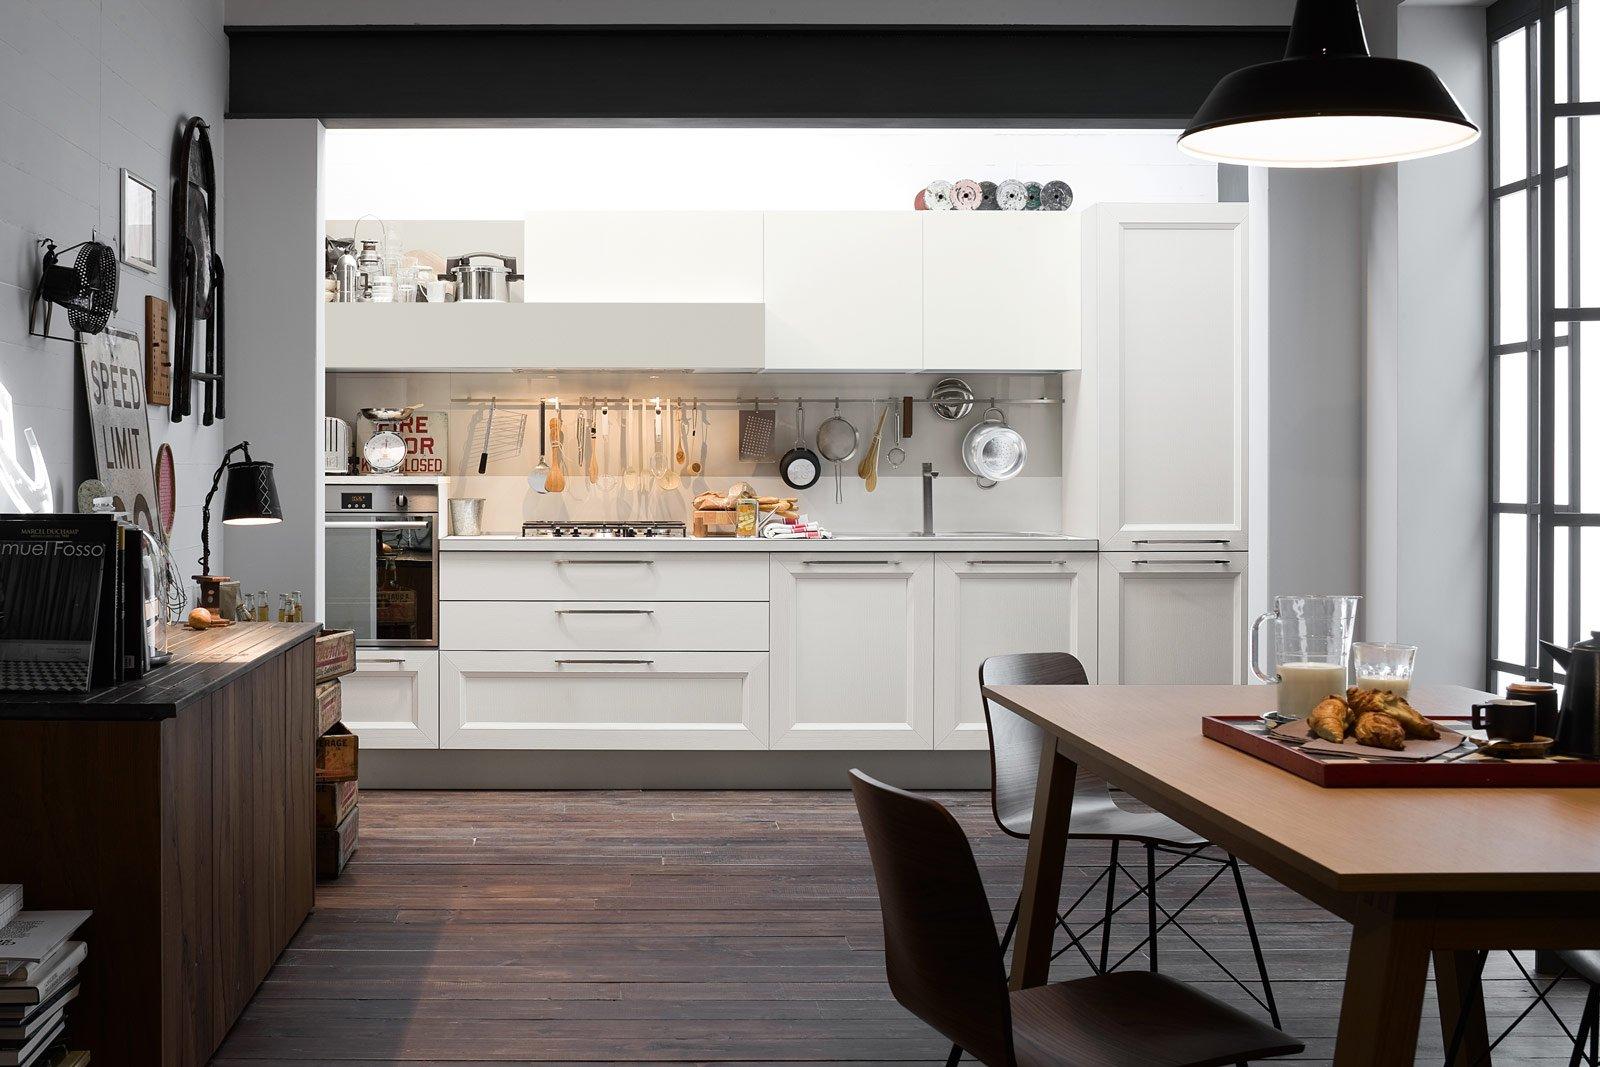 Tablet Di Veneta Cucine Ha Le Basi Coordinate Nella Raffinata Finitura  #846447 1600 1067 Immagini Di Cucine Toscane